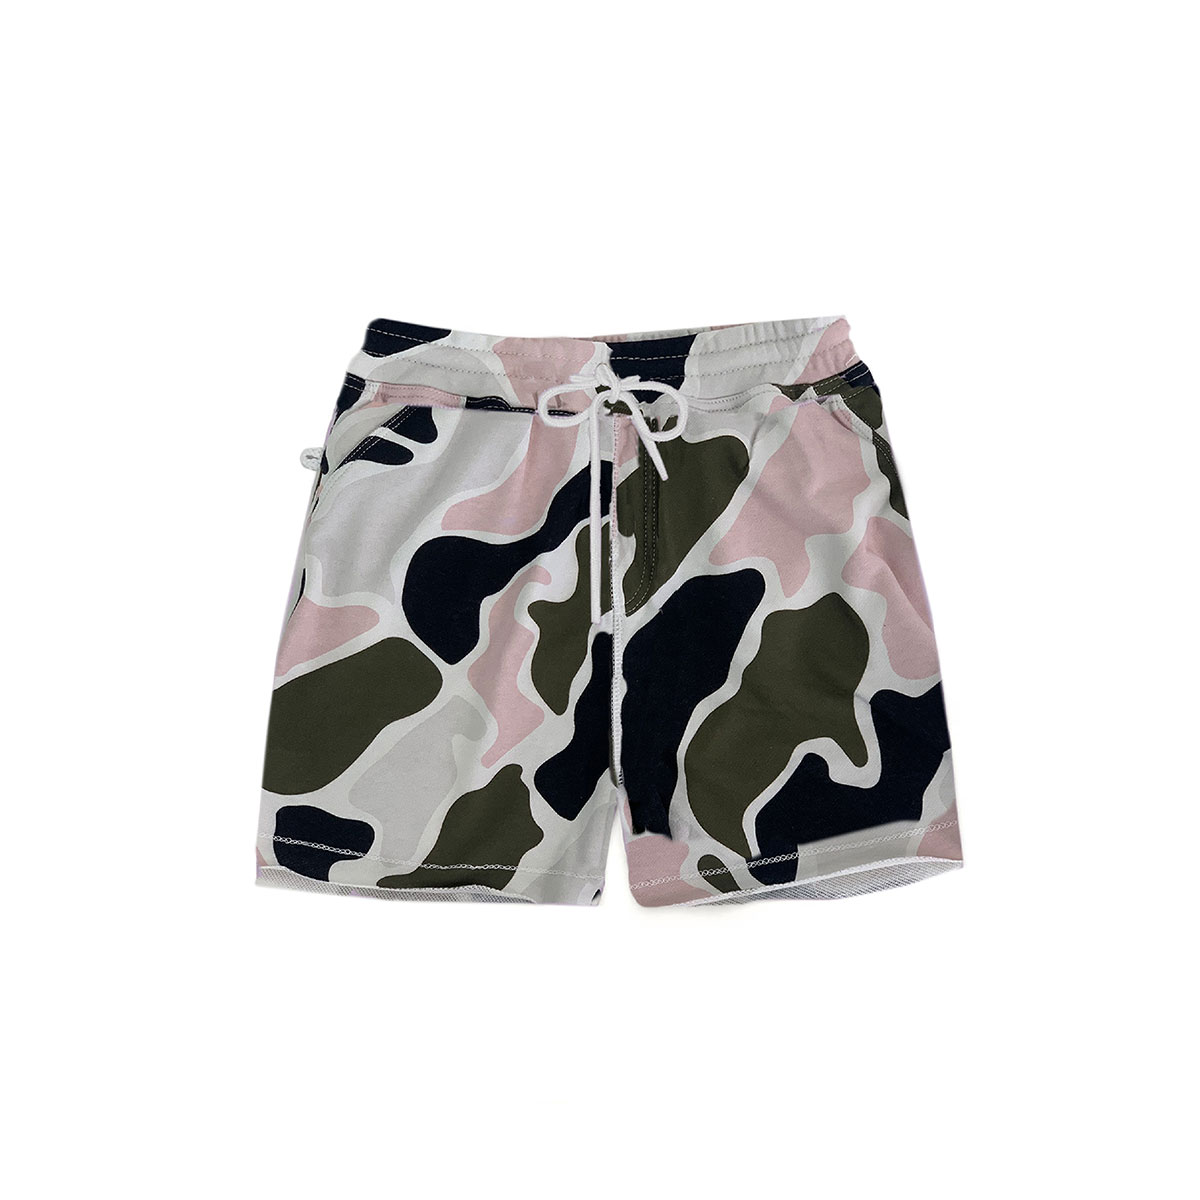 Jogging Shorts - Camouflage